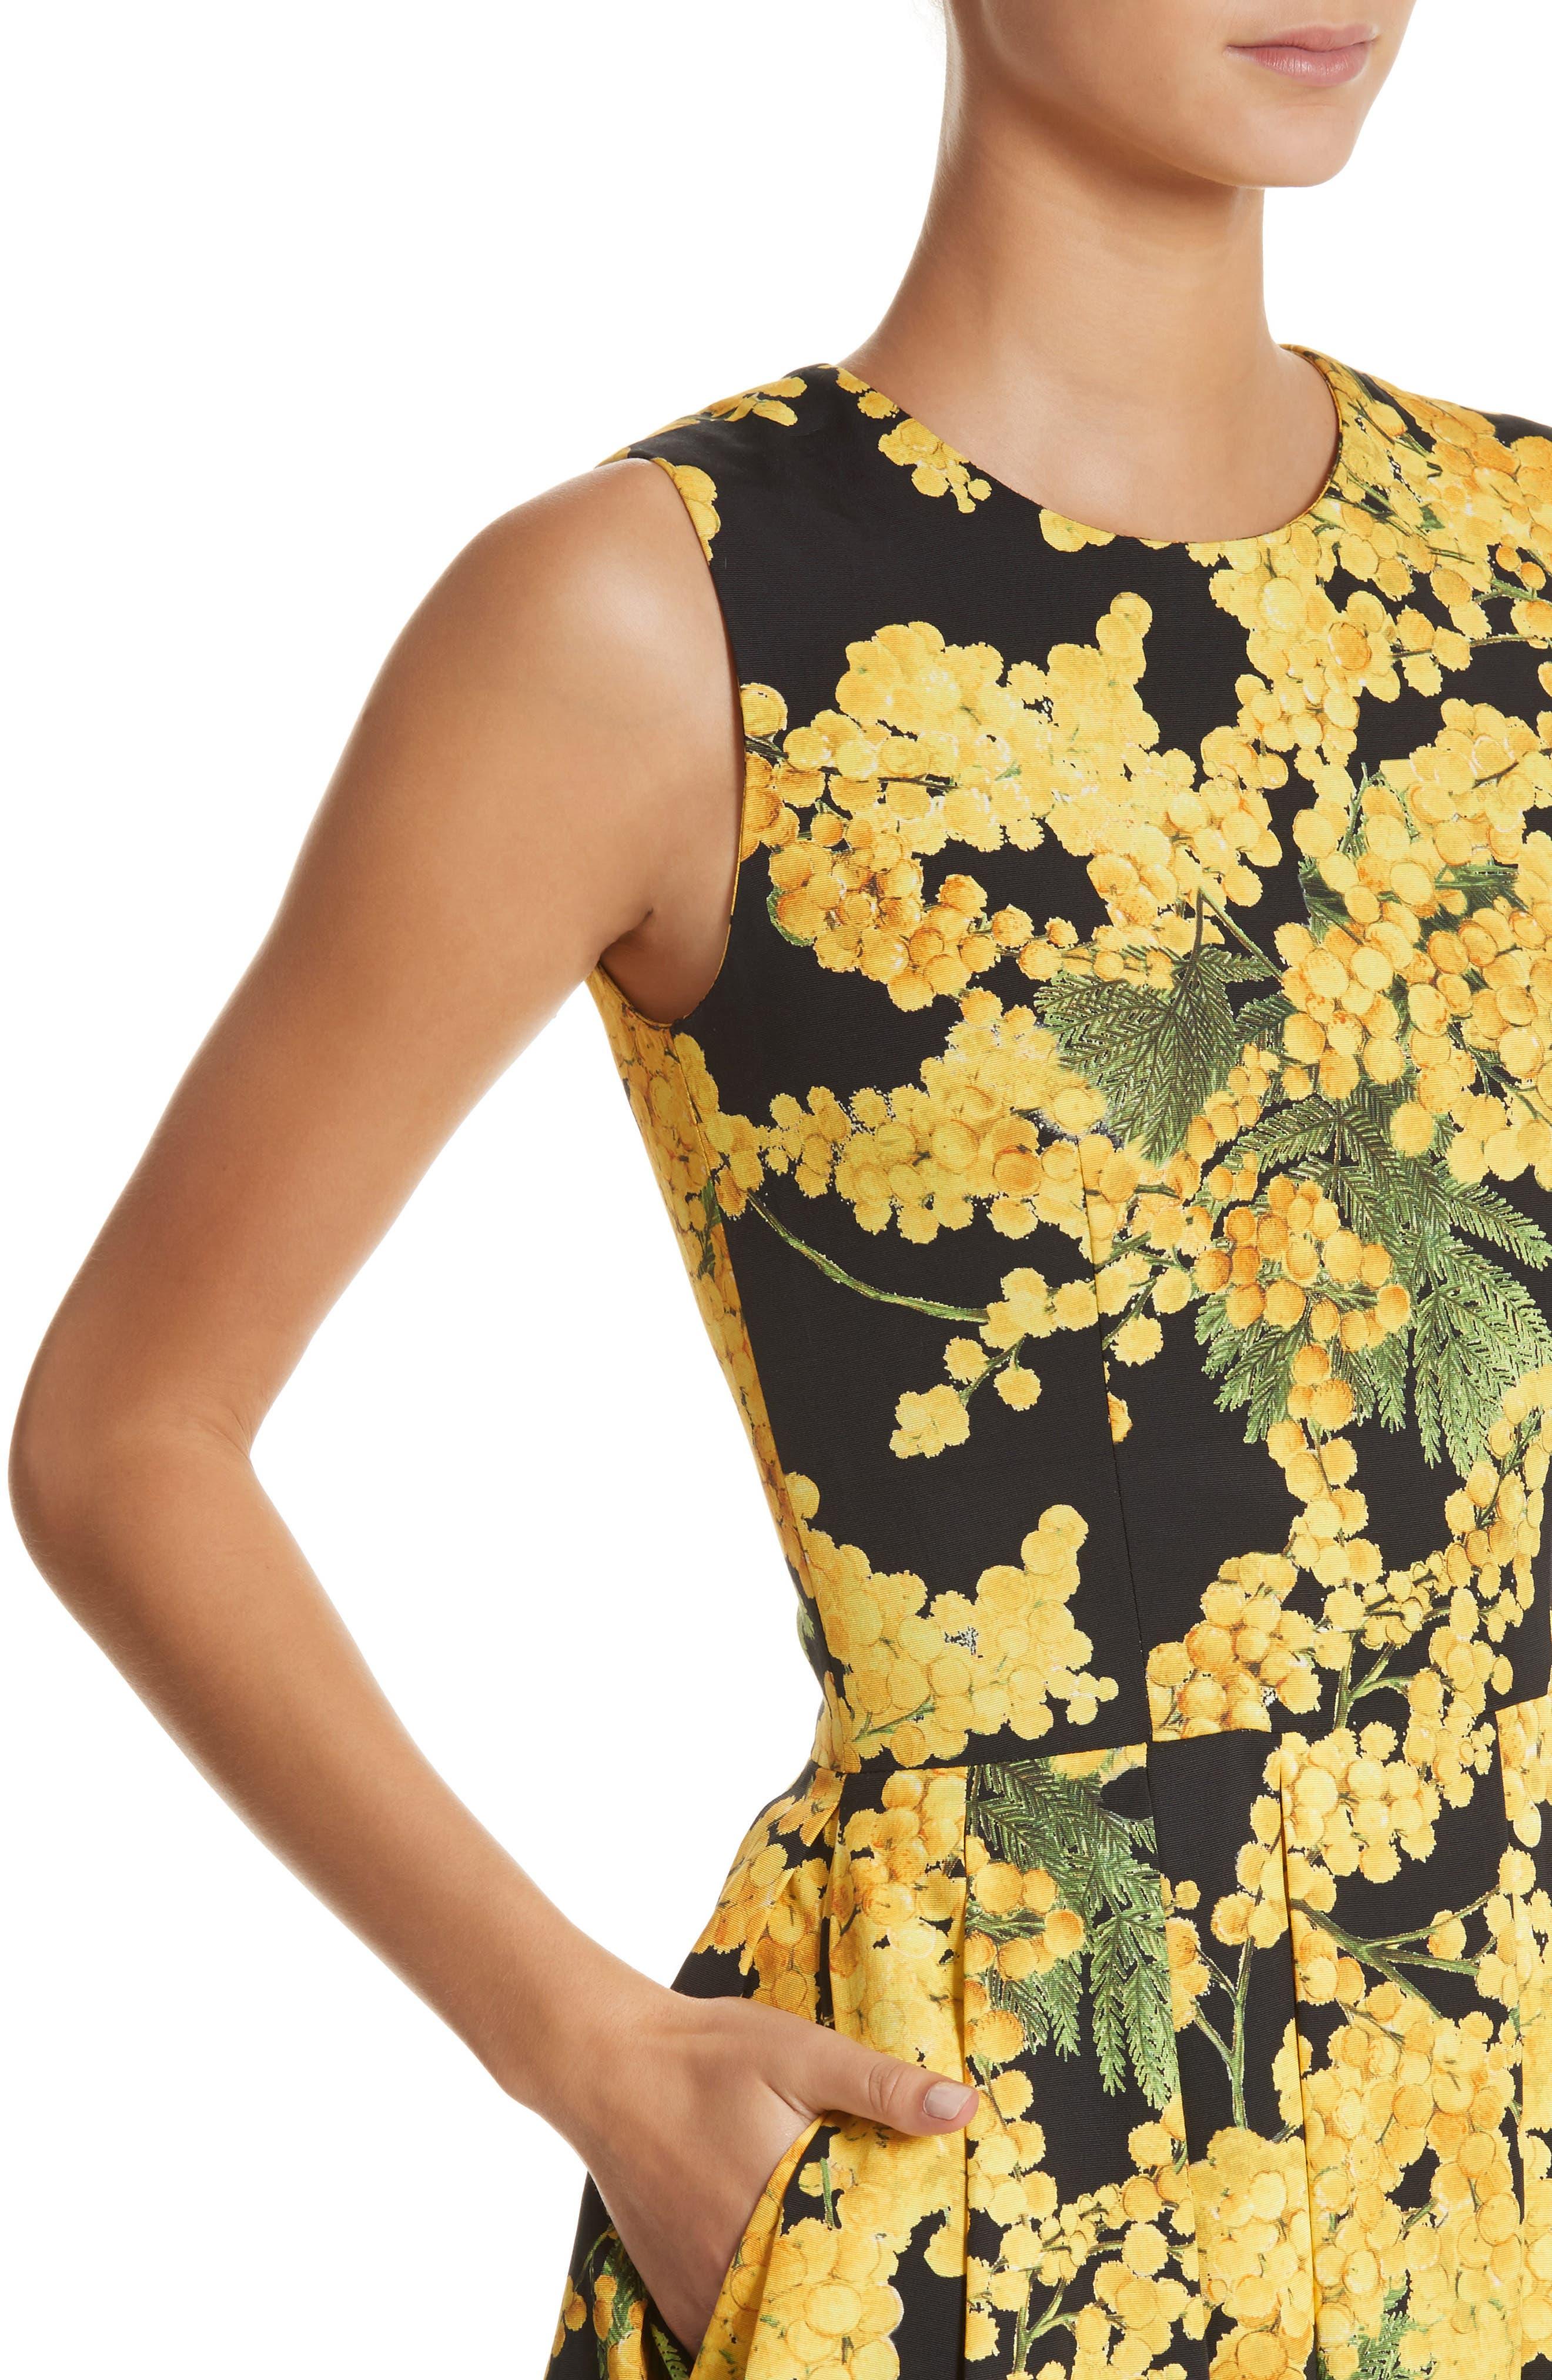 Floral Print Faille Day Dress,                             Alternate thumbnail 4, color,                             Freesia Yellow/Black